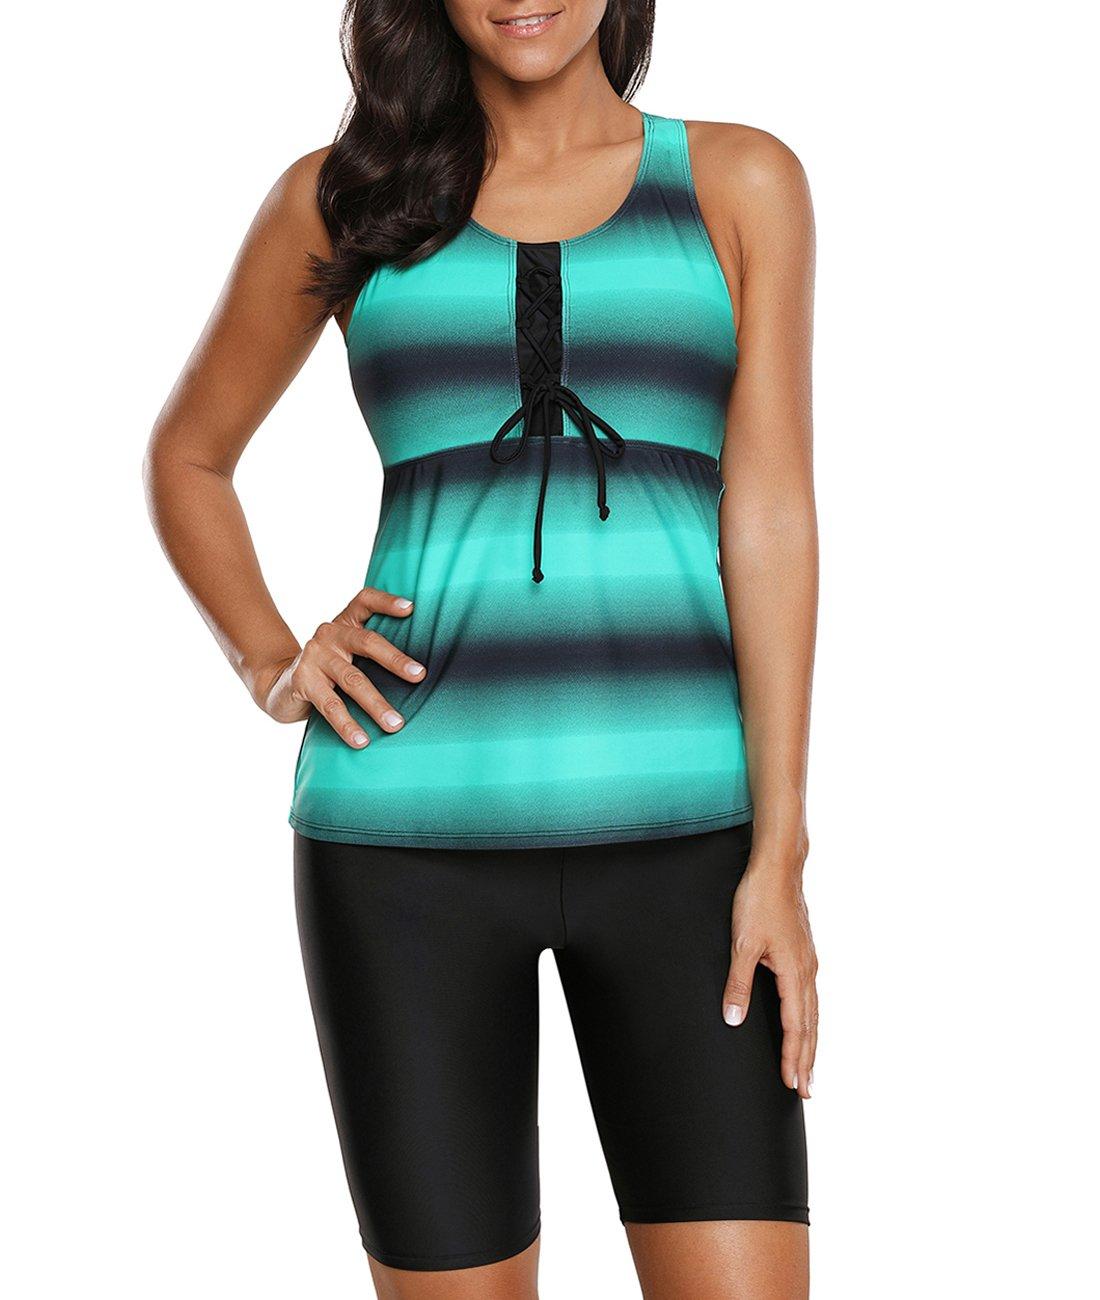 Urchics Womens Plus Size Racerback Tankini Swimsuit Rash Guard Swimwear Green XL